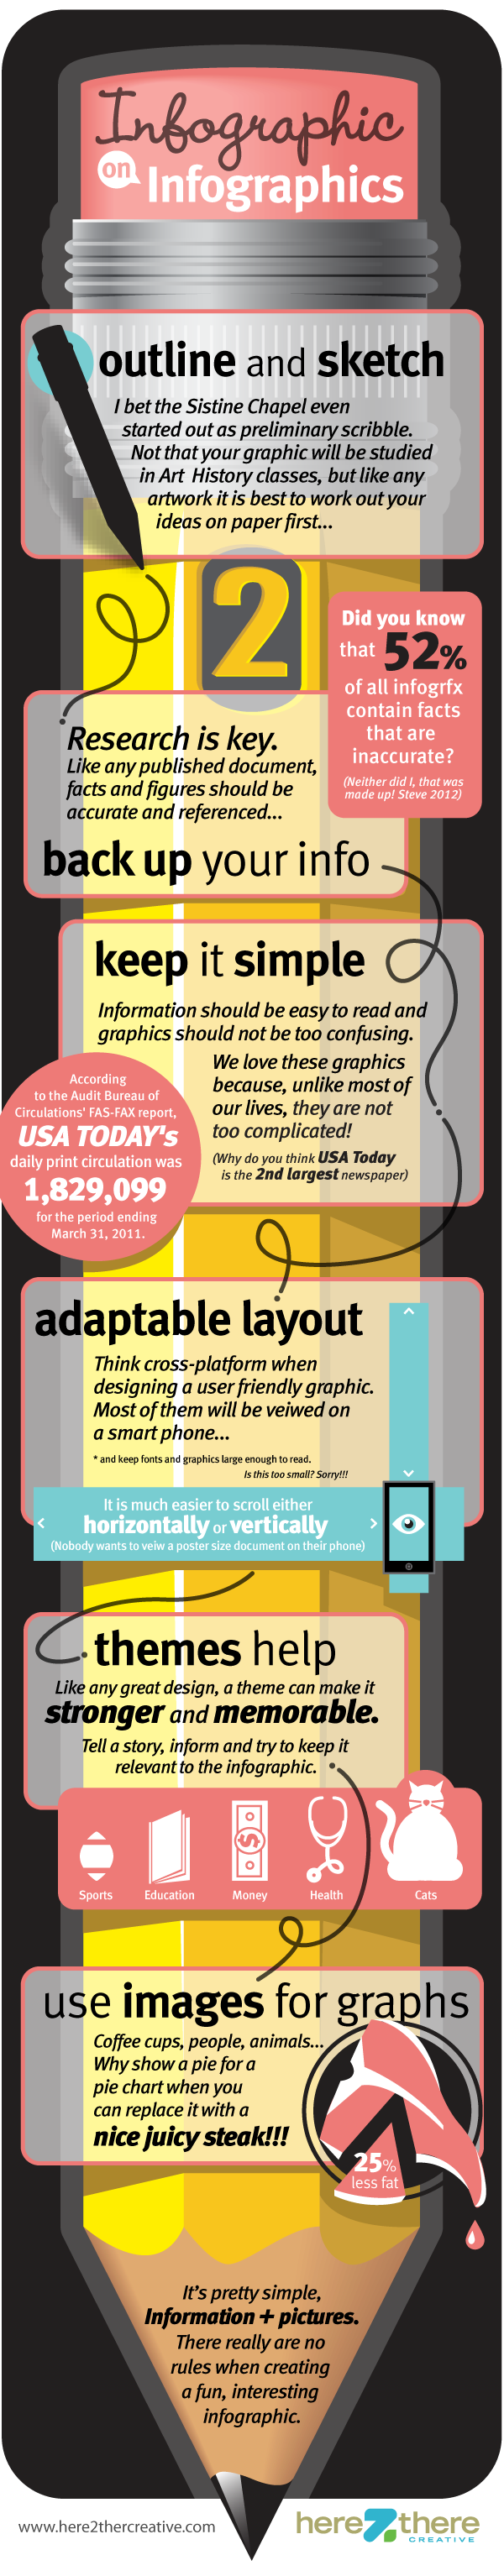 Credits: InfographicList.com